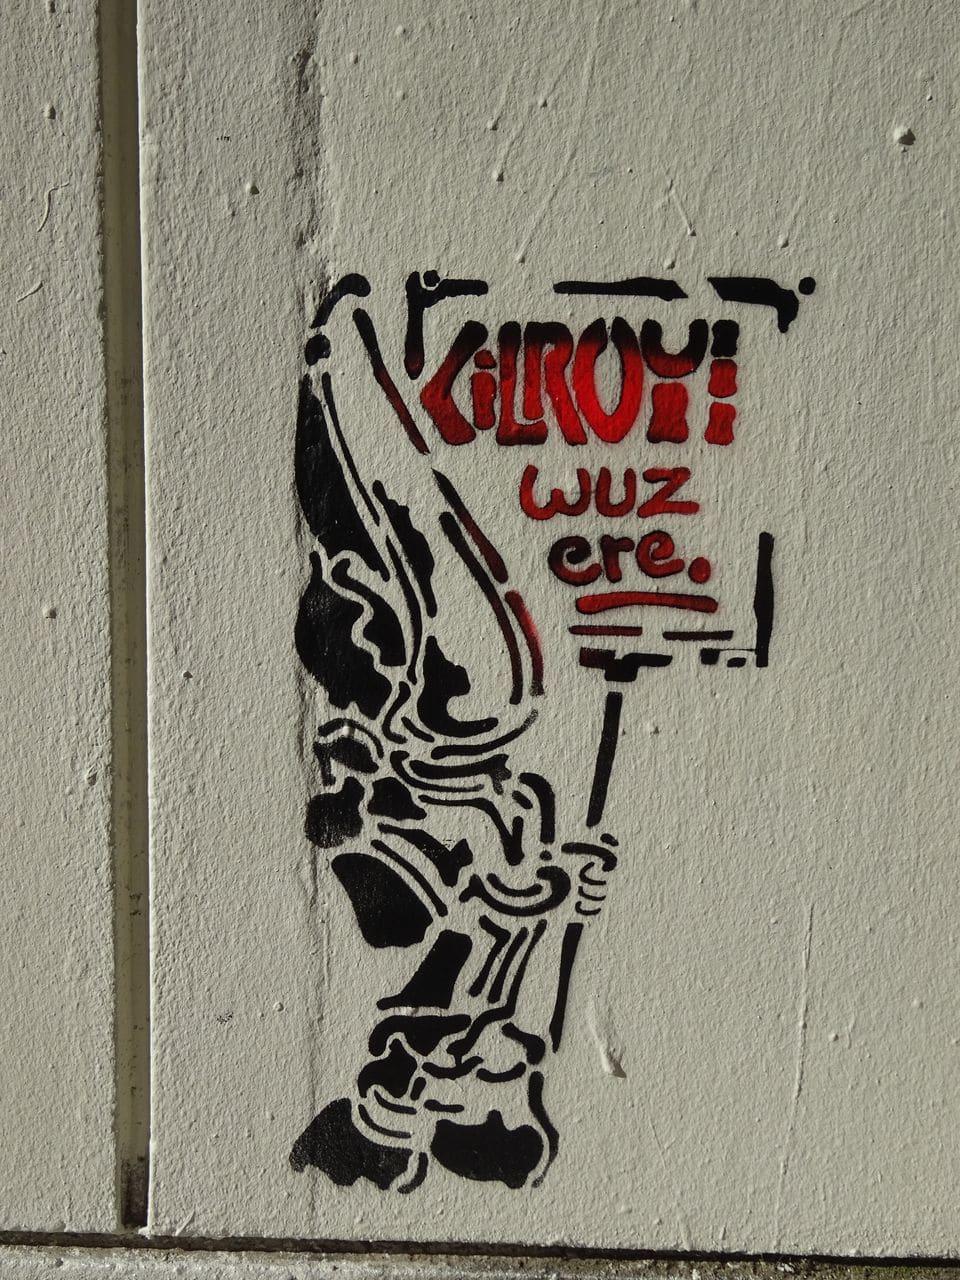 kilroy was here lyon street art